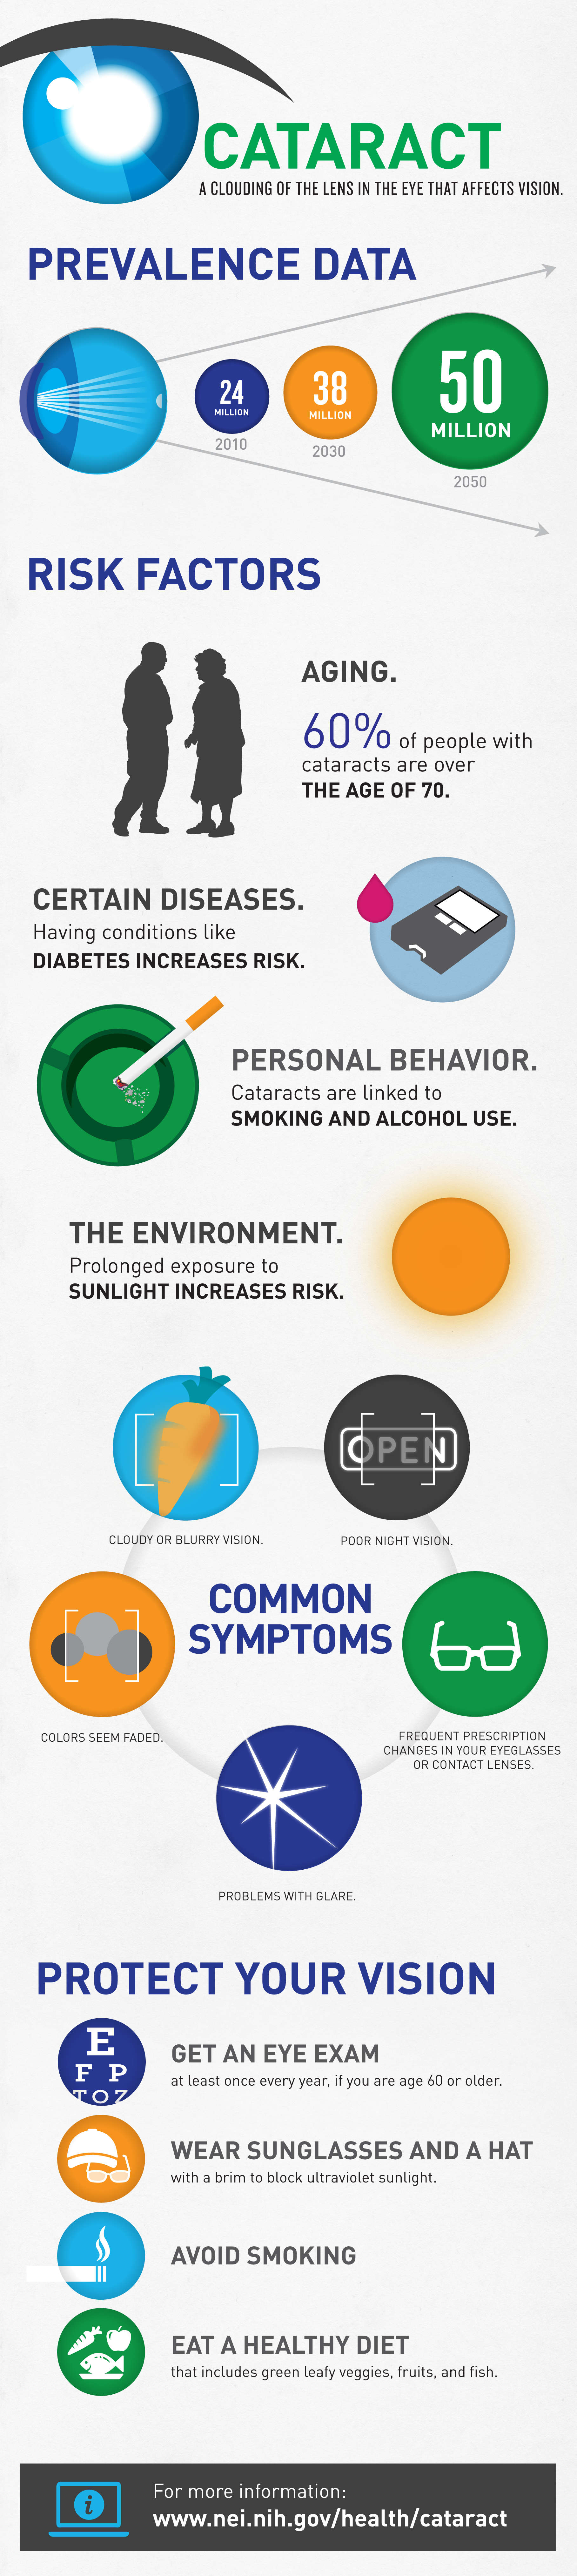 Cataract, prevalence, risk factors, symptoms, prevention